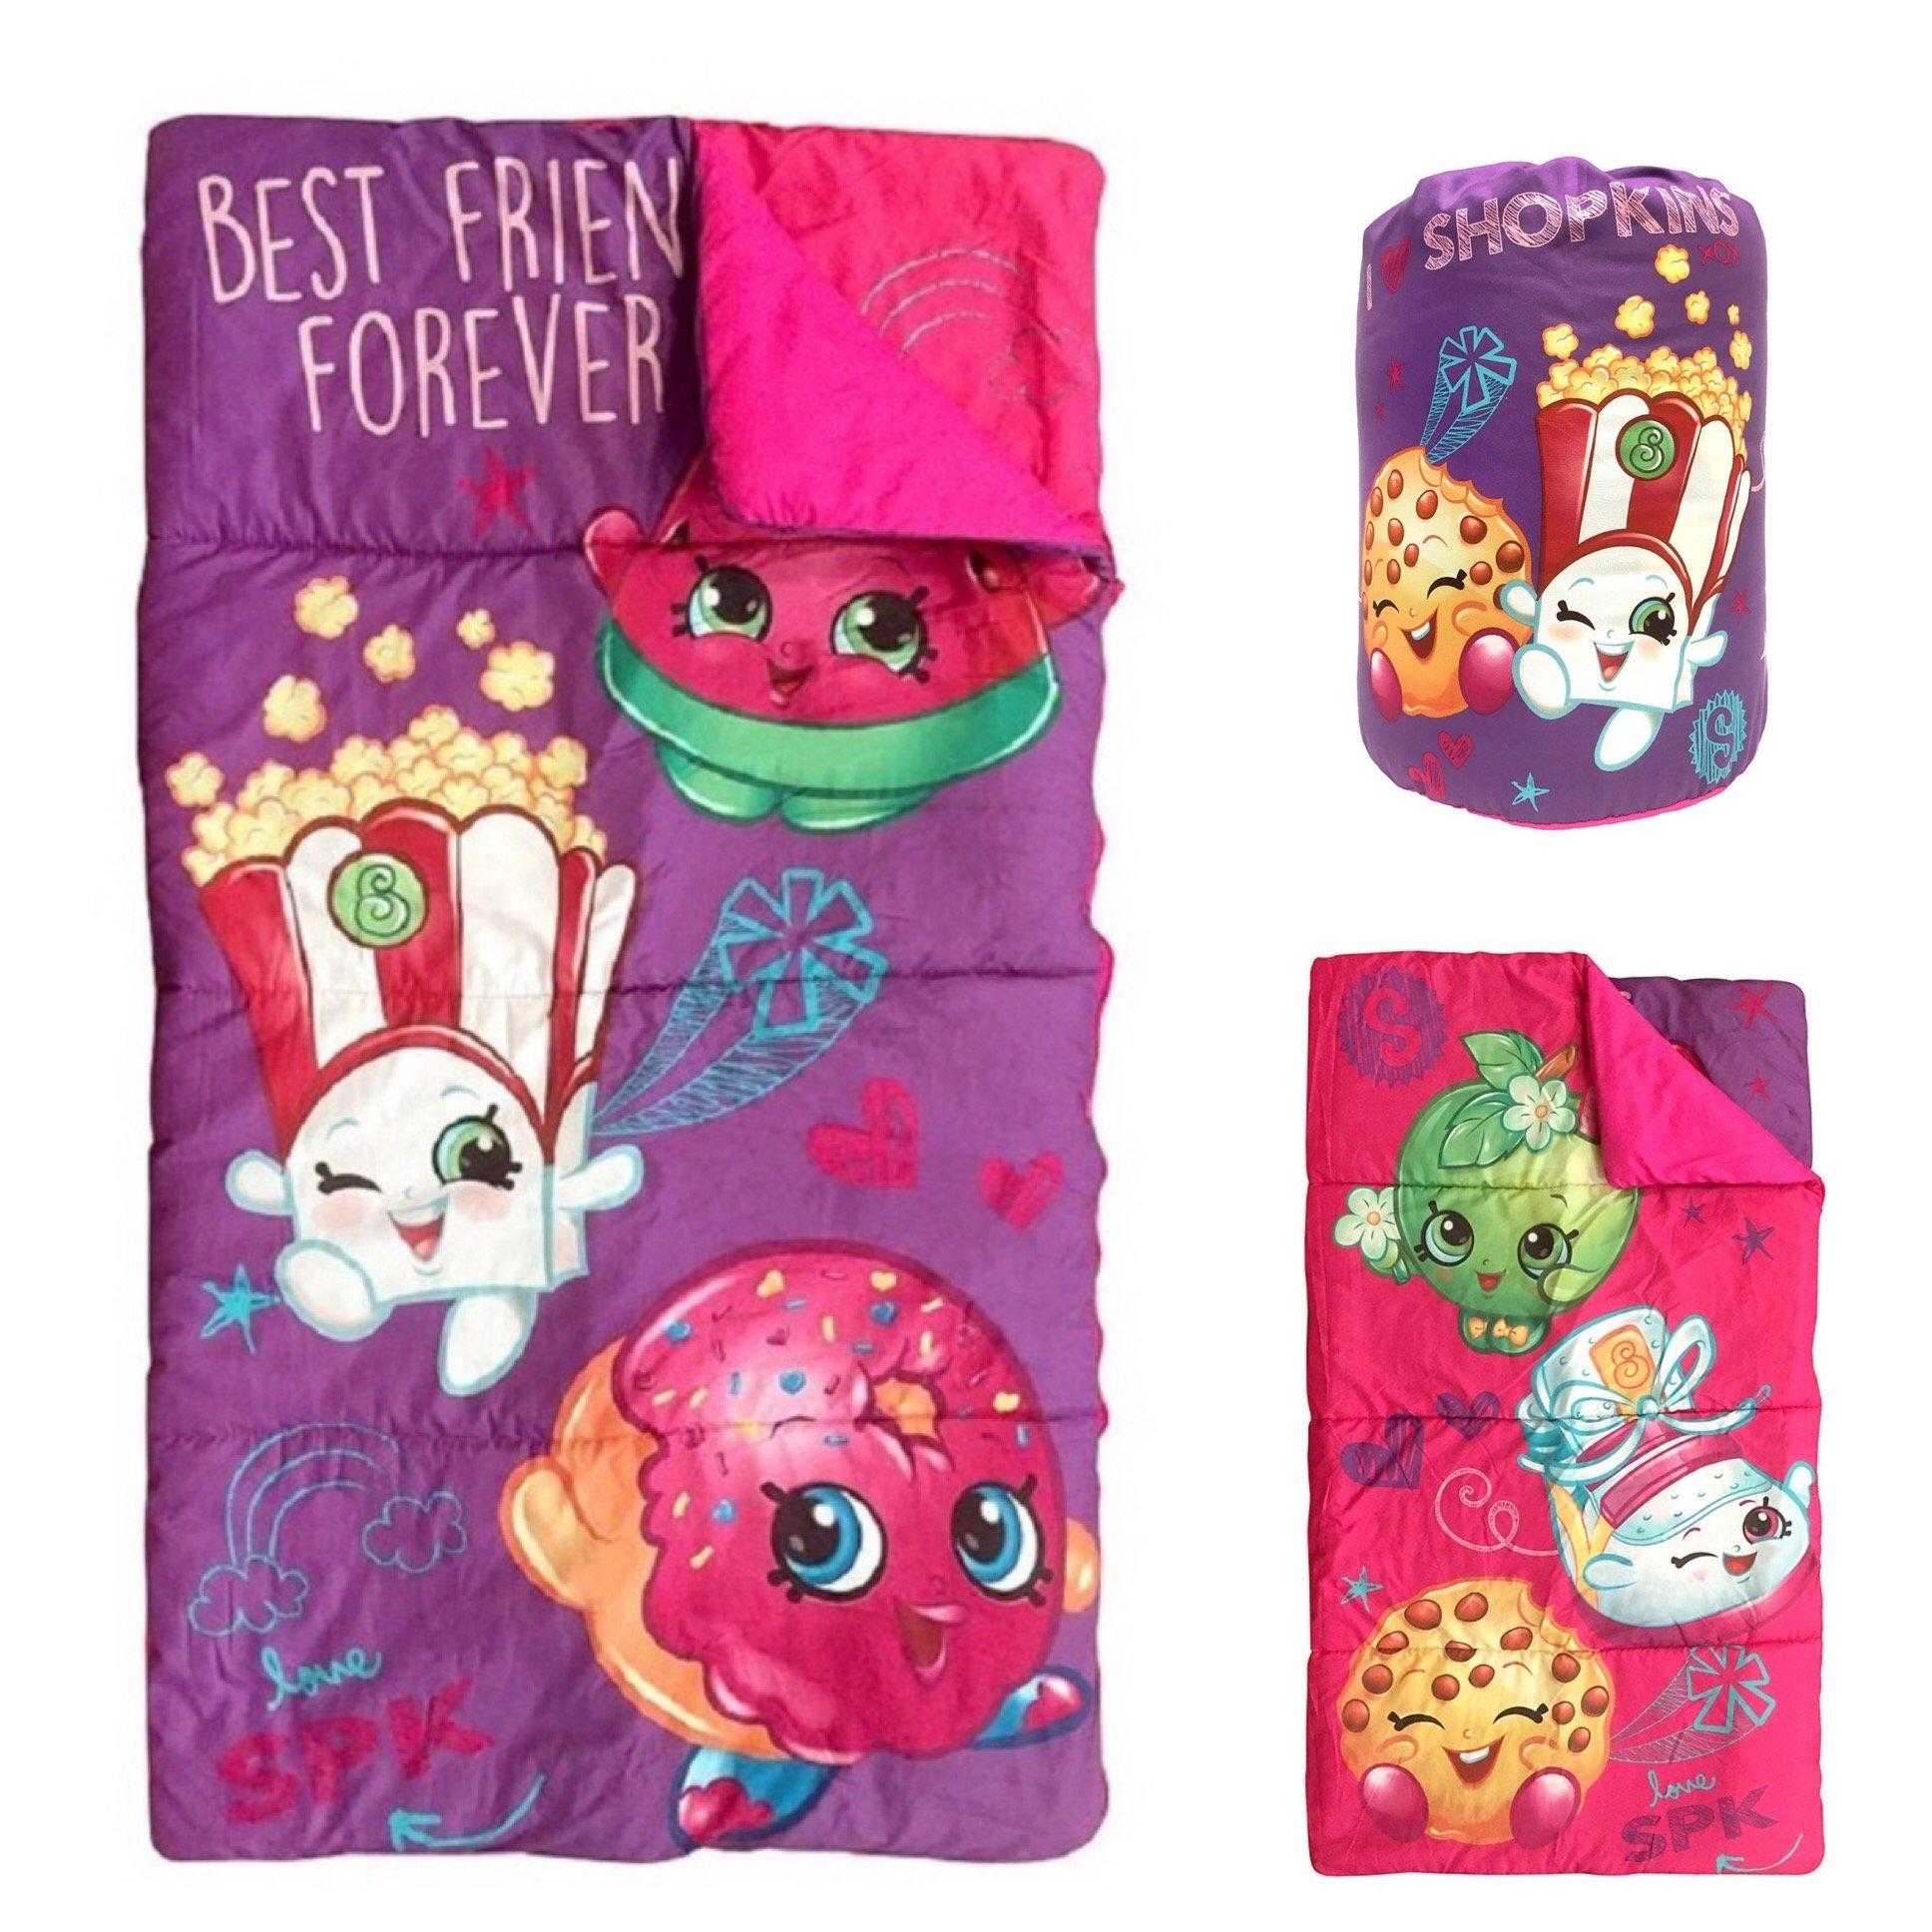 Shopkins Reversible Slumber Bag - Kids